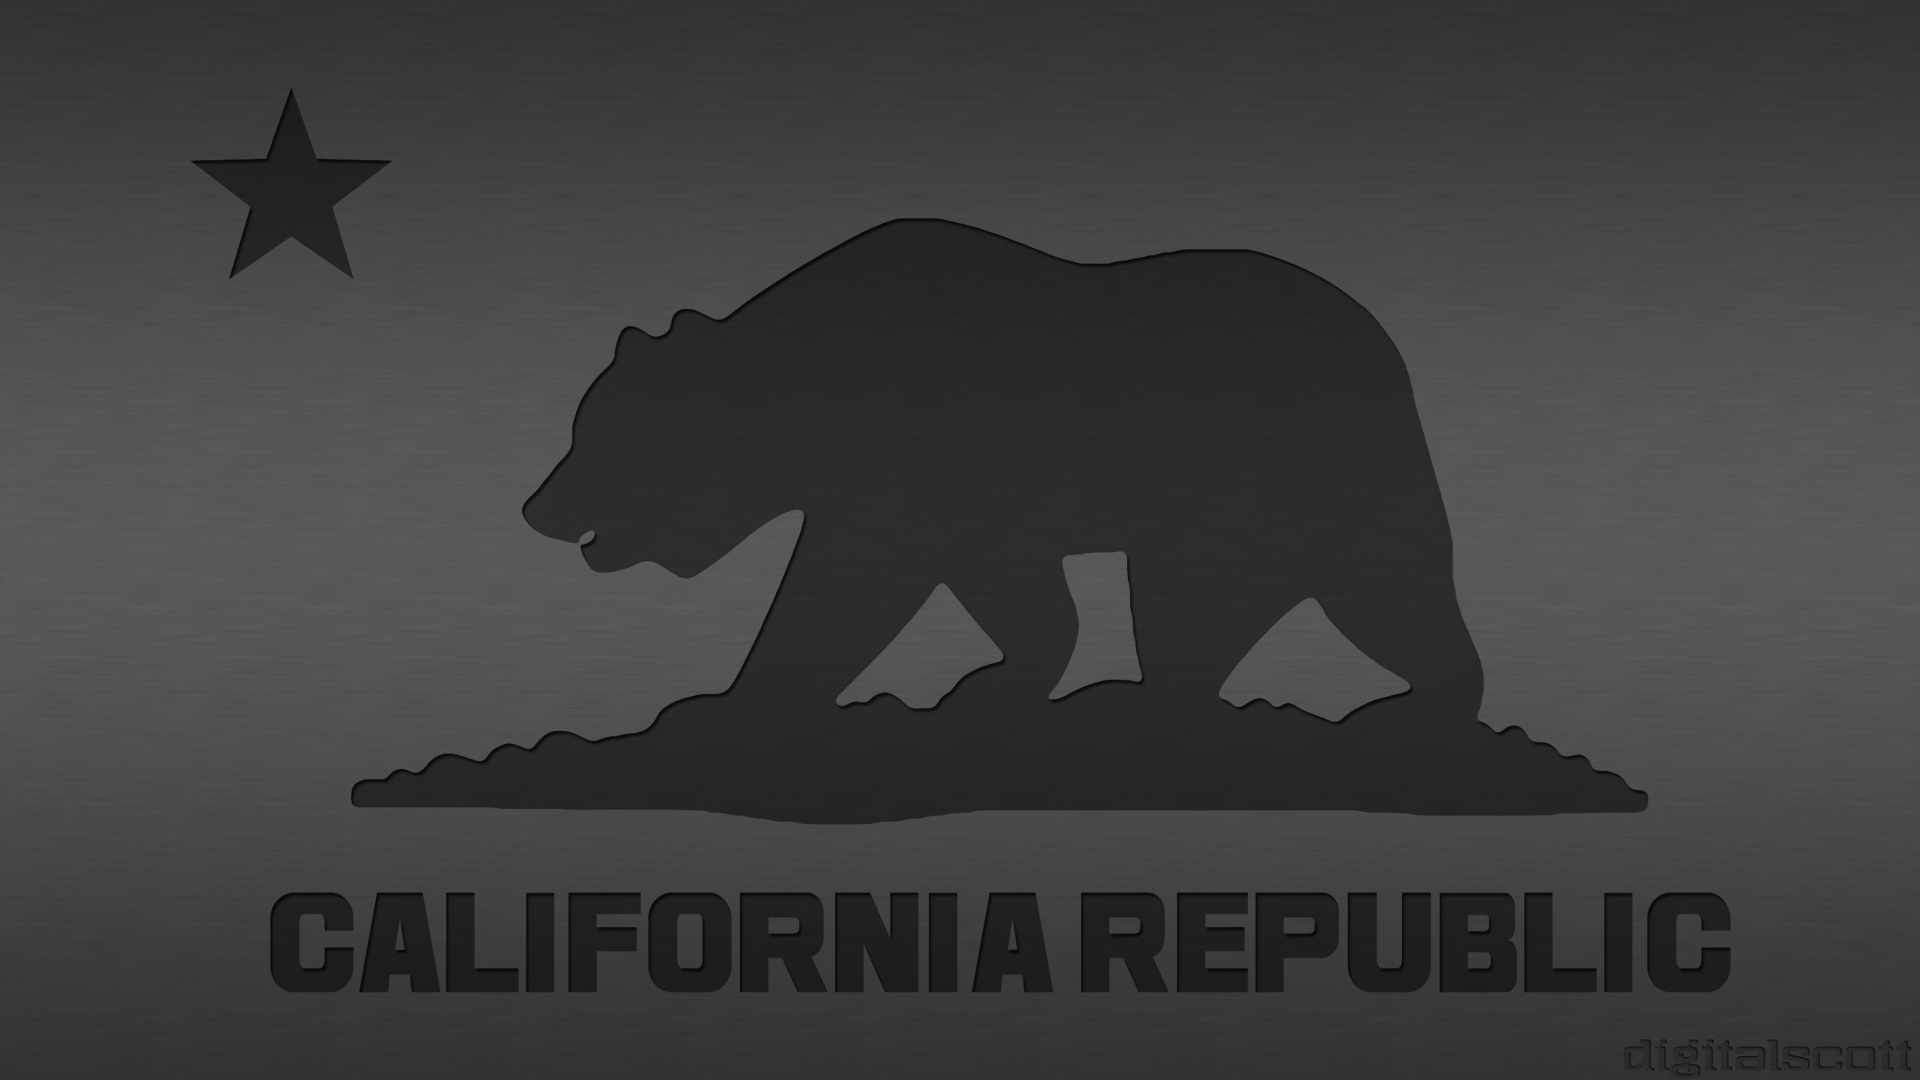 Displaying 19 Images For   California Republic Logo Wallpaper 1920x1080